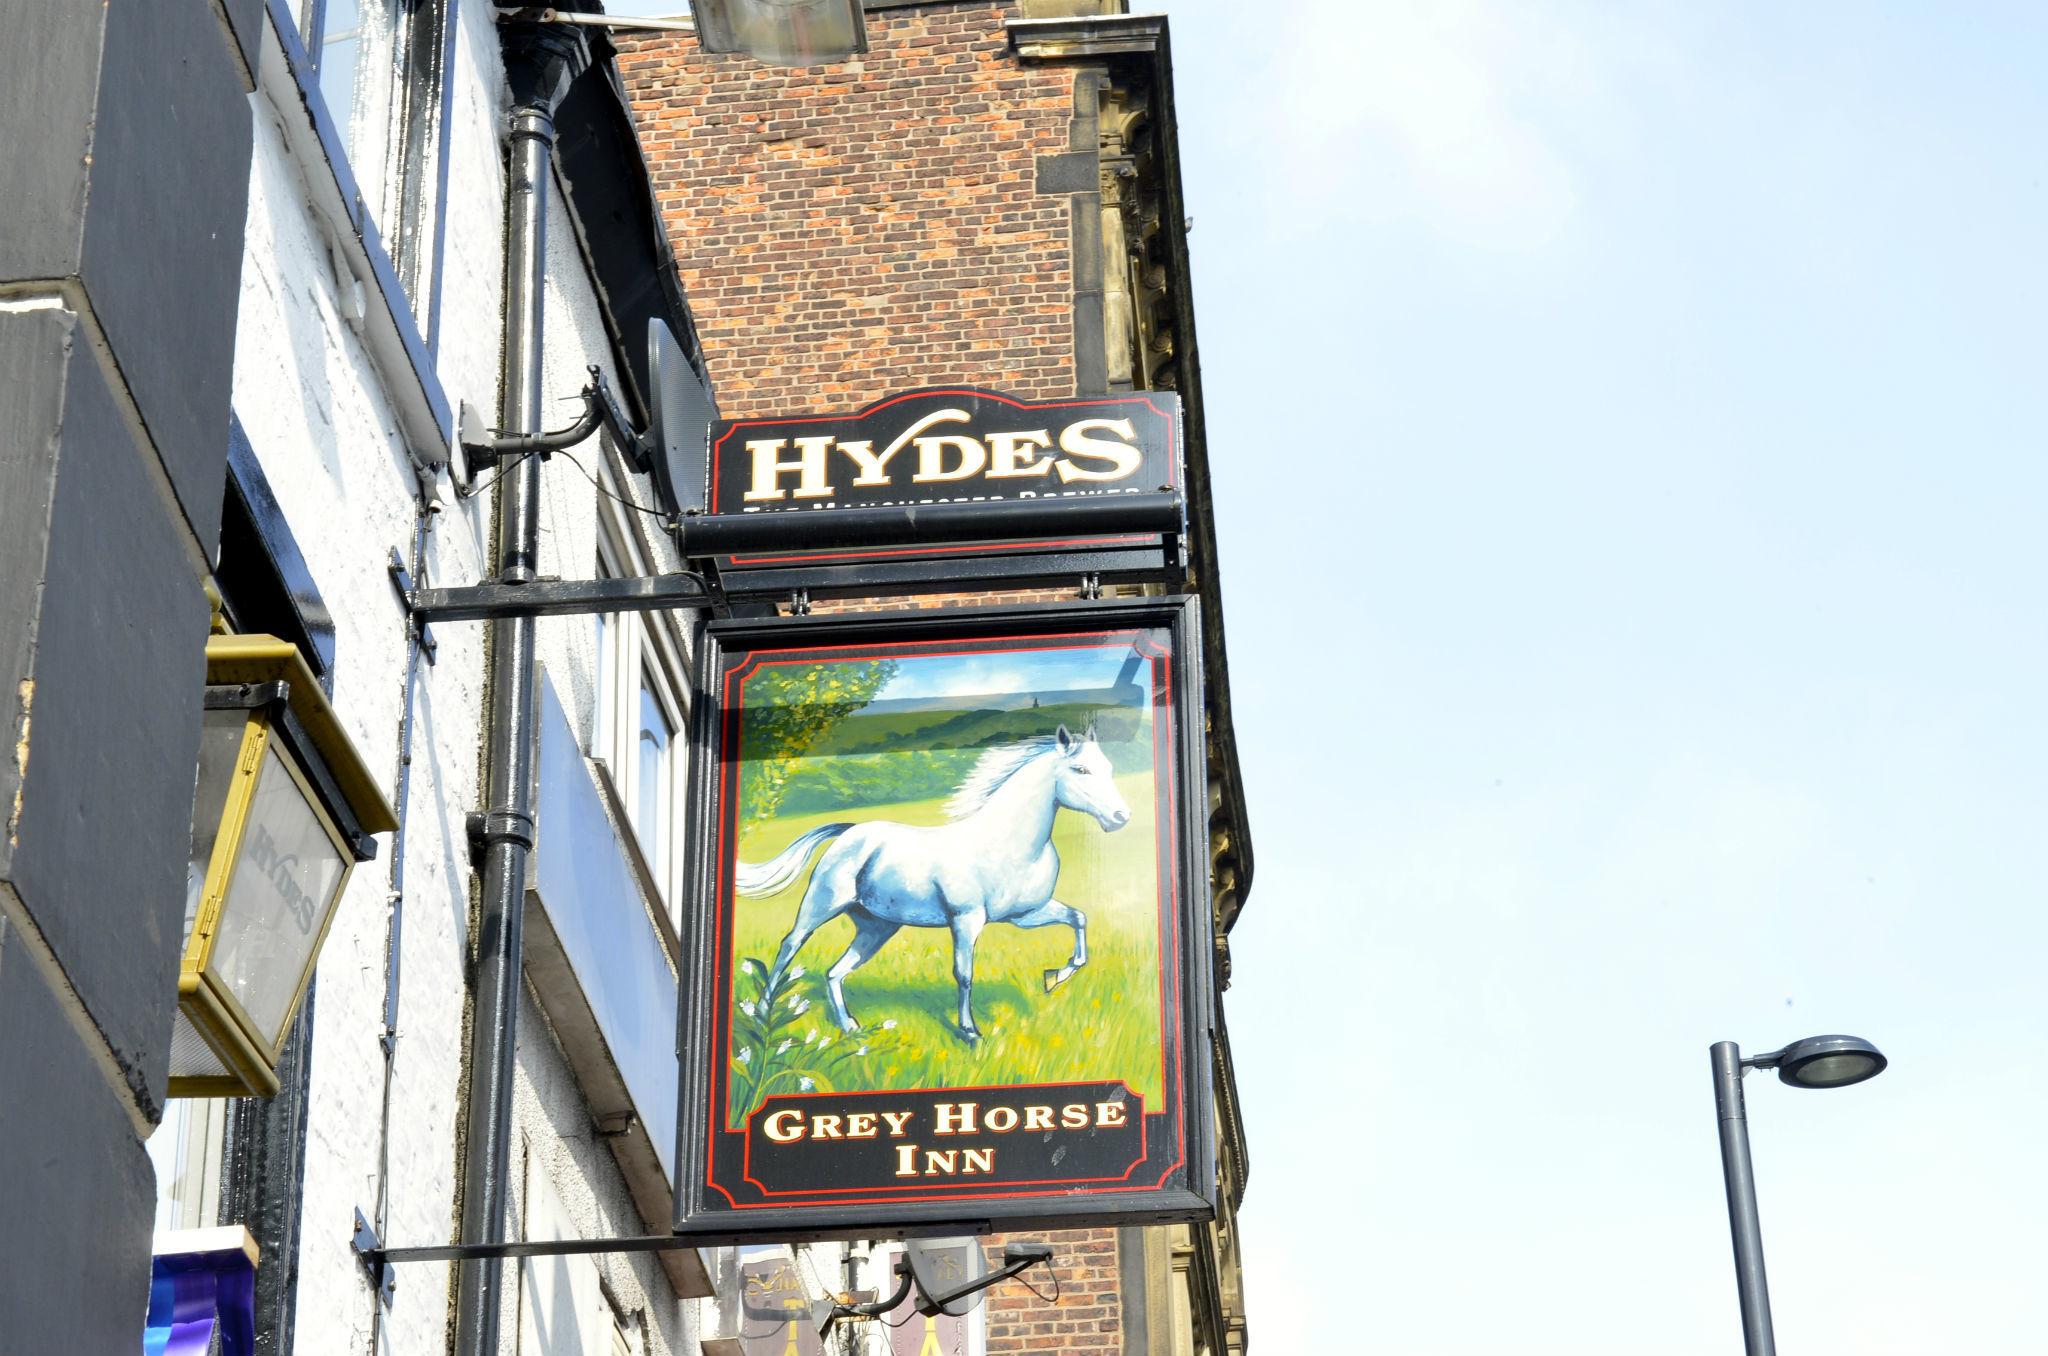 Grey Horse, Manchester